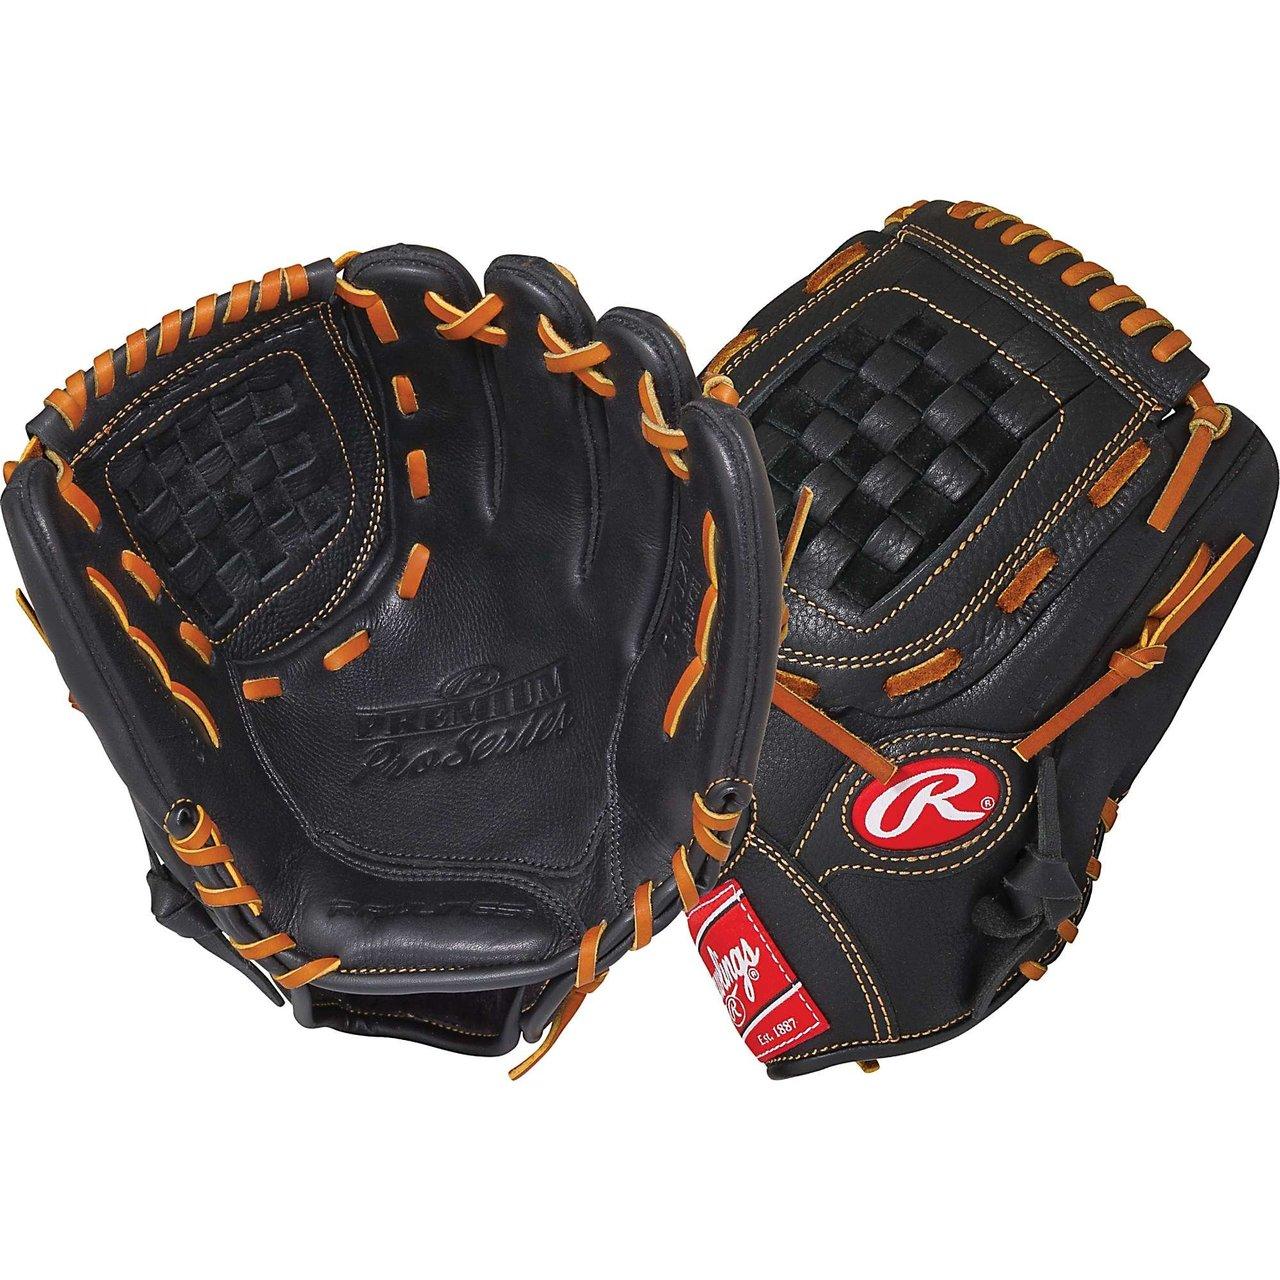 rawlings-premium-pro-series-12-inch-baseball-glove-ppr1200-right-hand-throw PPR1200-Right Hand Throw Rawlings New Rawlings Premium Pro Series 12 inch Baseball Glove PPR1200 Right Hand